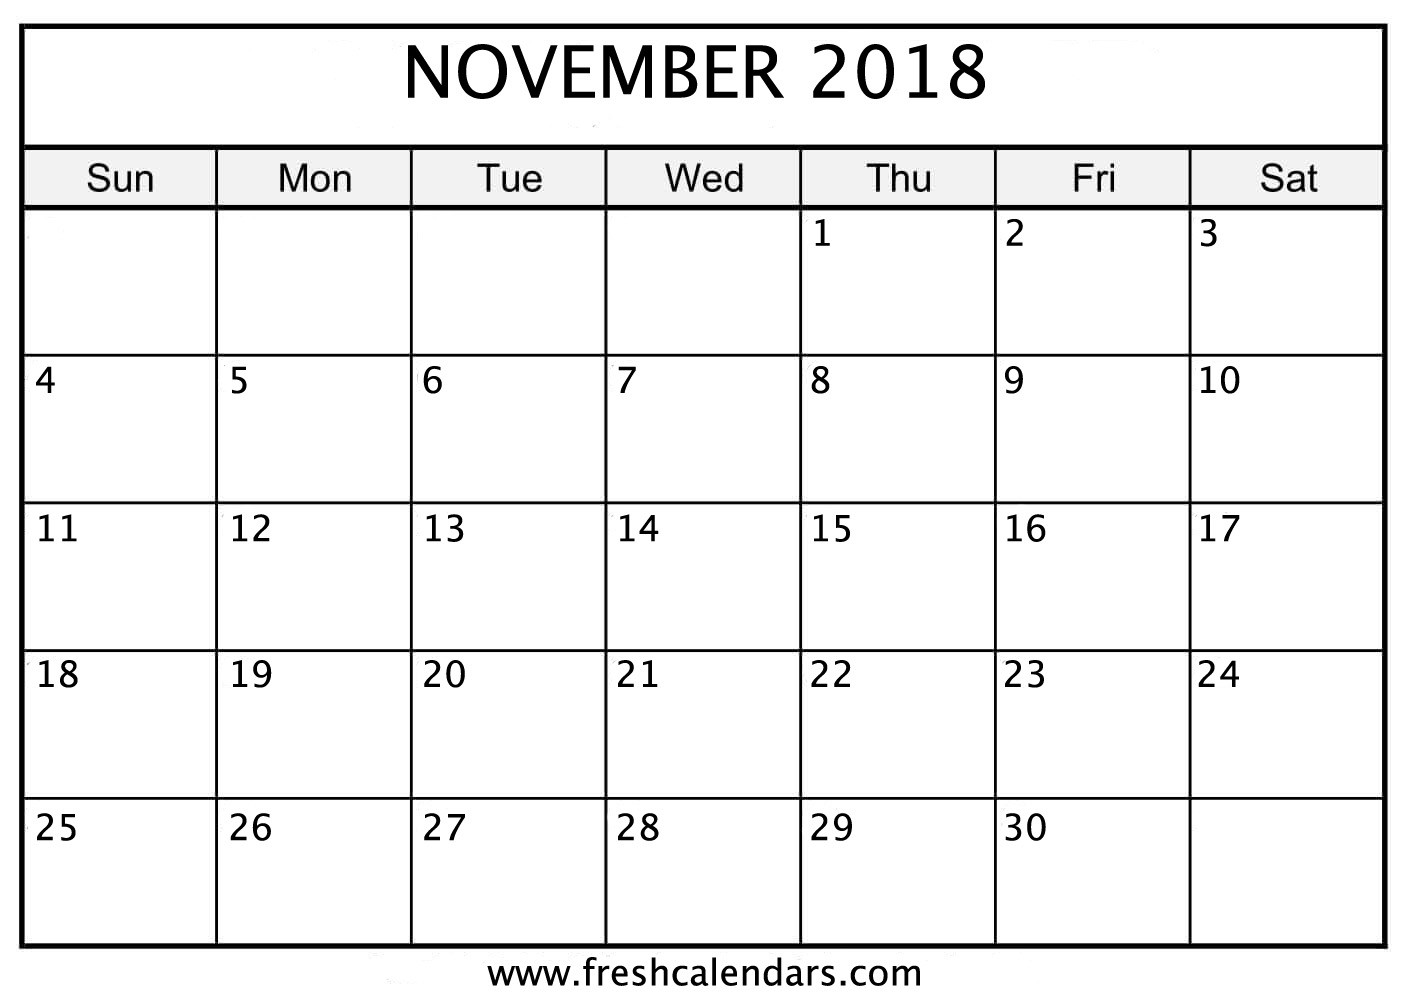 Blank November 2018 Calendar Printable Free